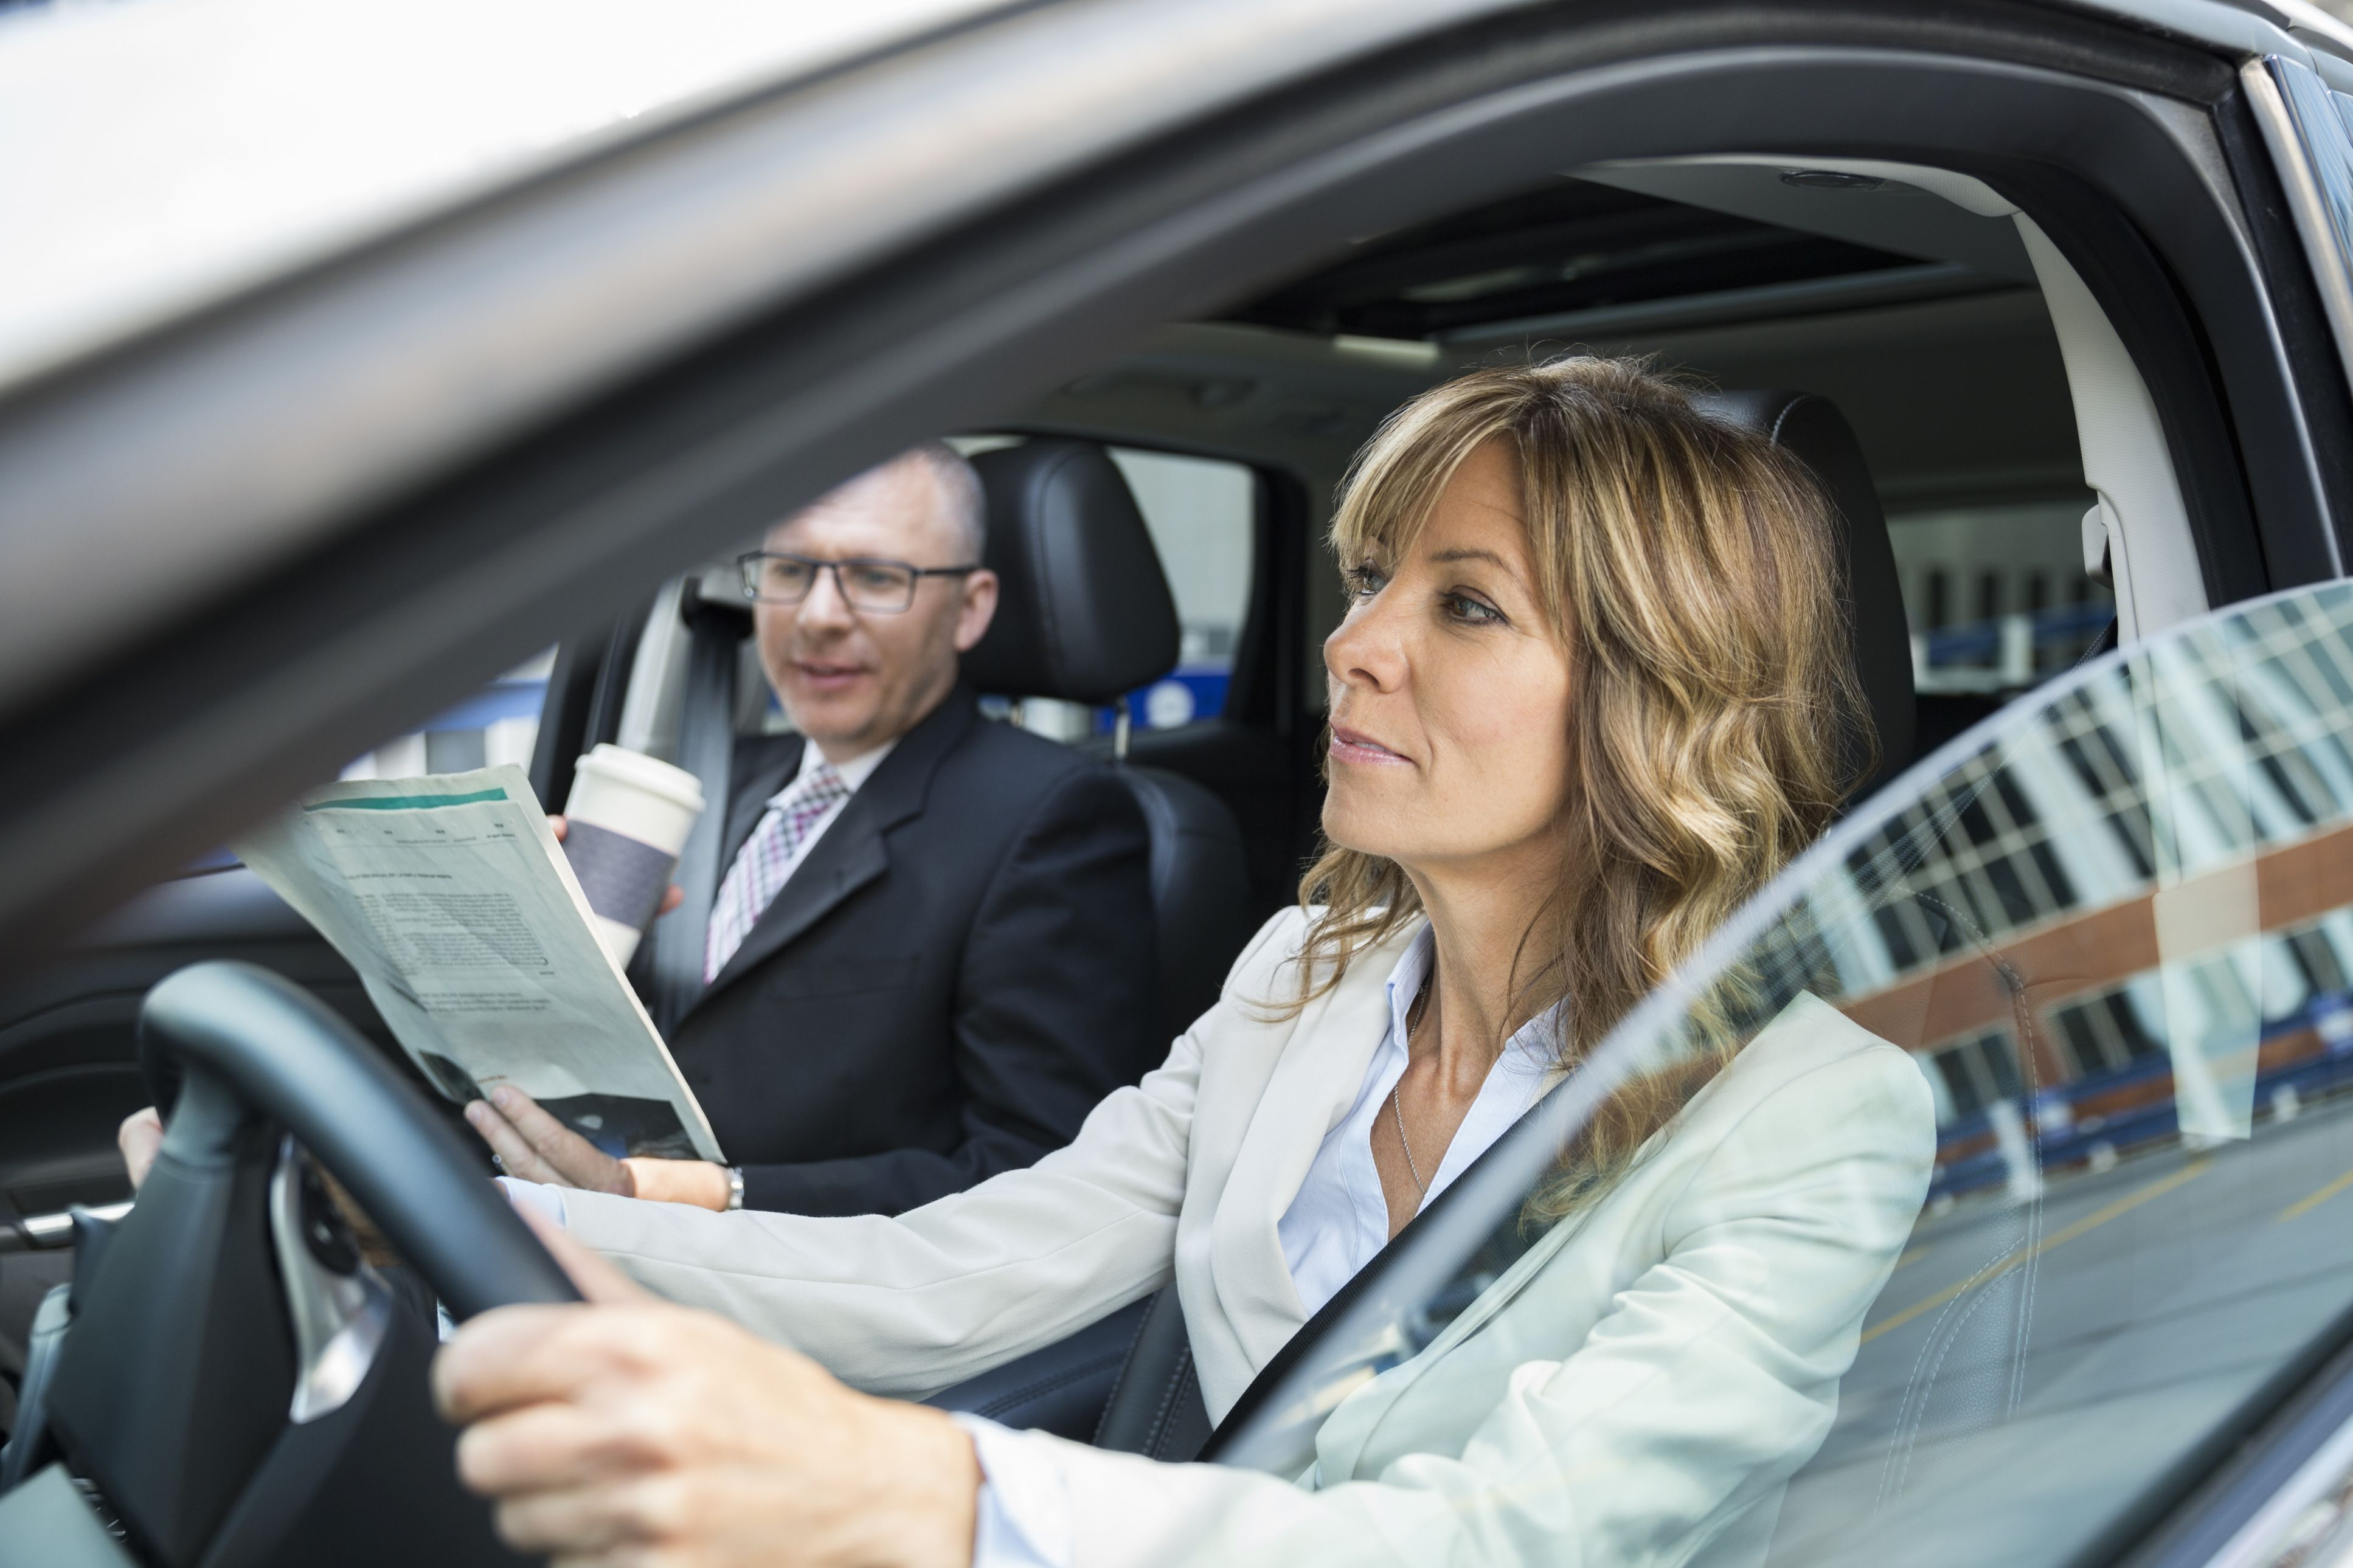 buying a car or leasing a car